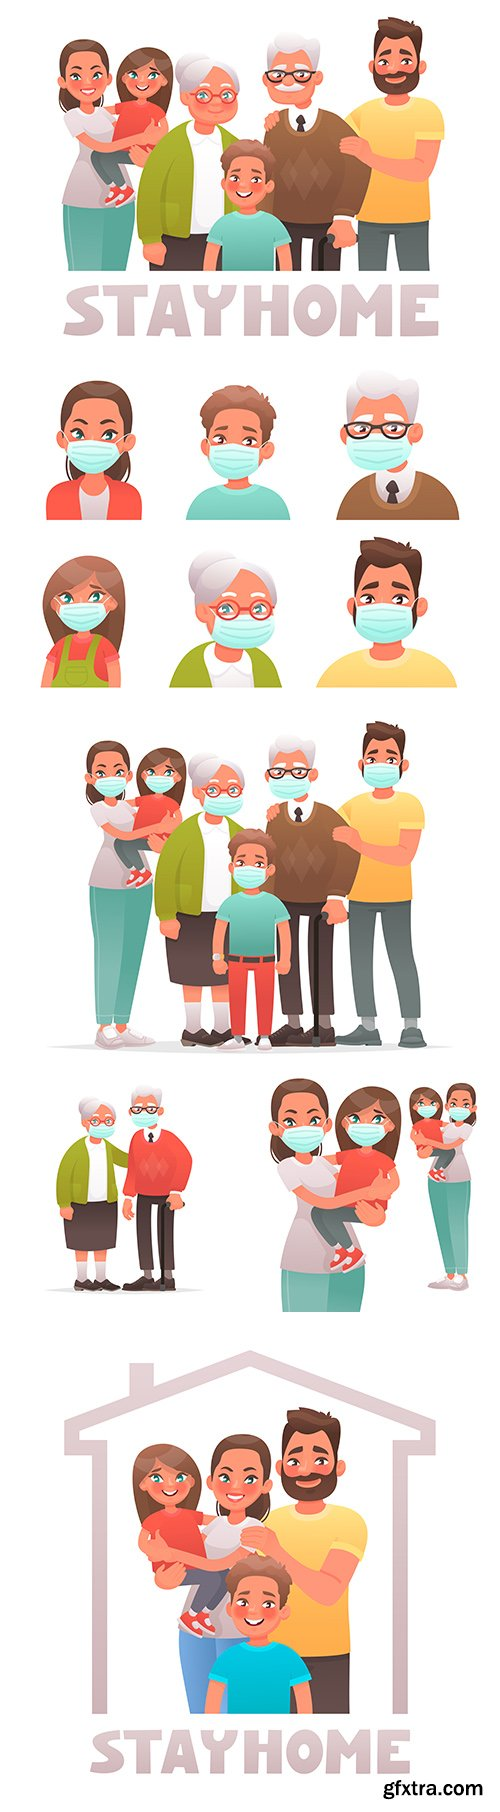 Family wearing protective medical masks from coronavirus